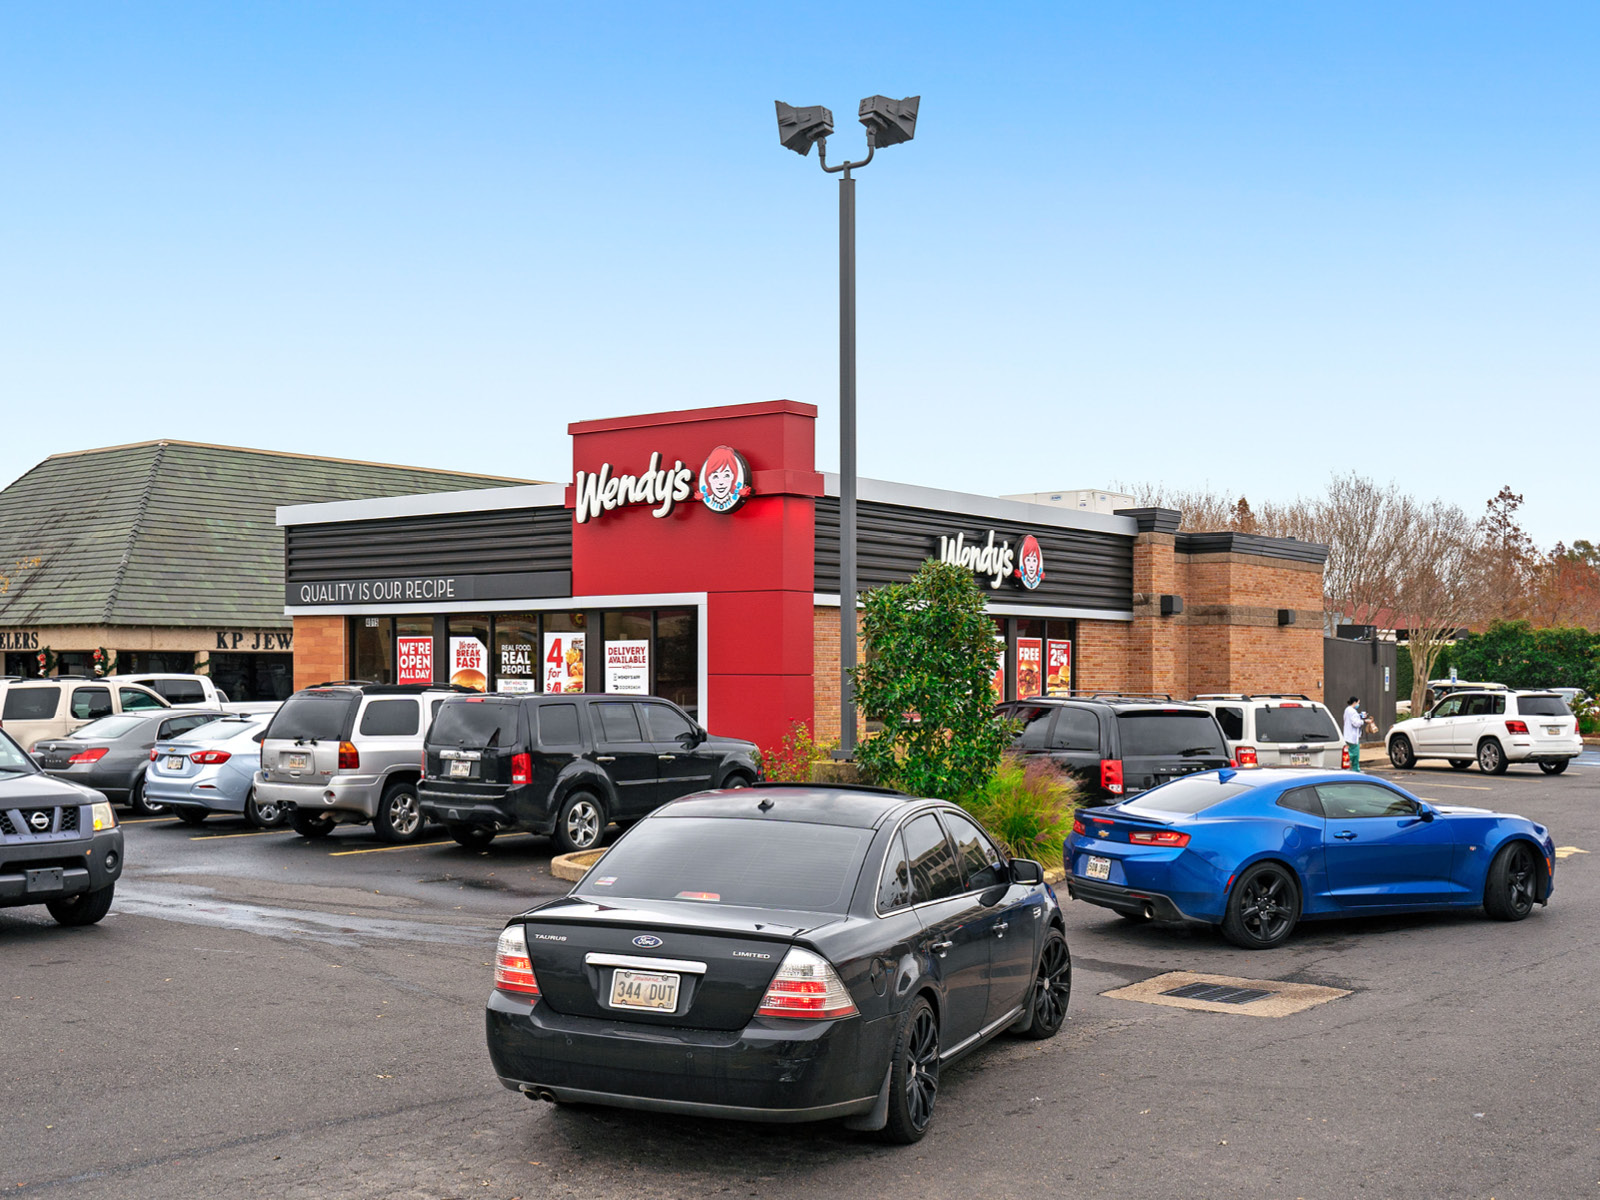 Hanley Investment Group Arranges Sale of Single-Tenant Wendy's Drive-Thru in Alexandria, La. to California Buyer